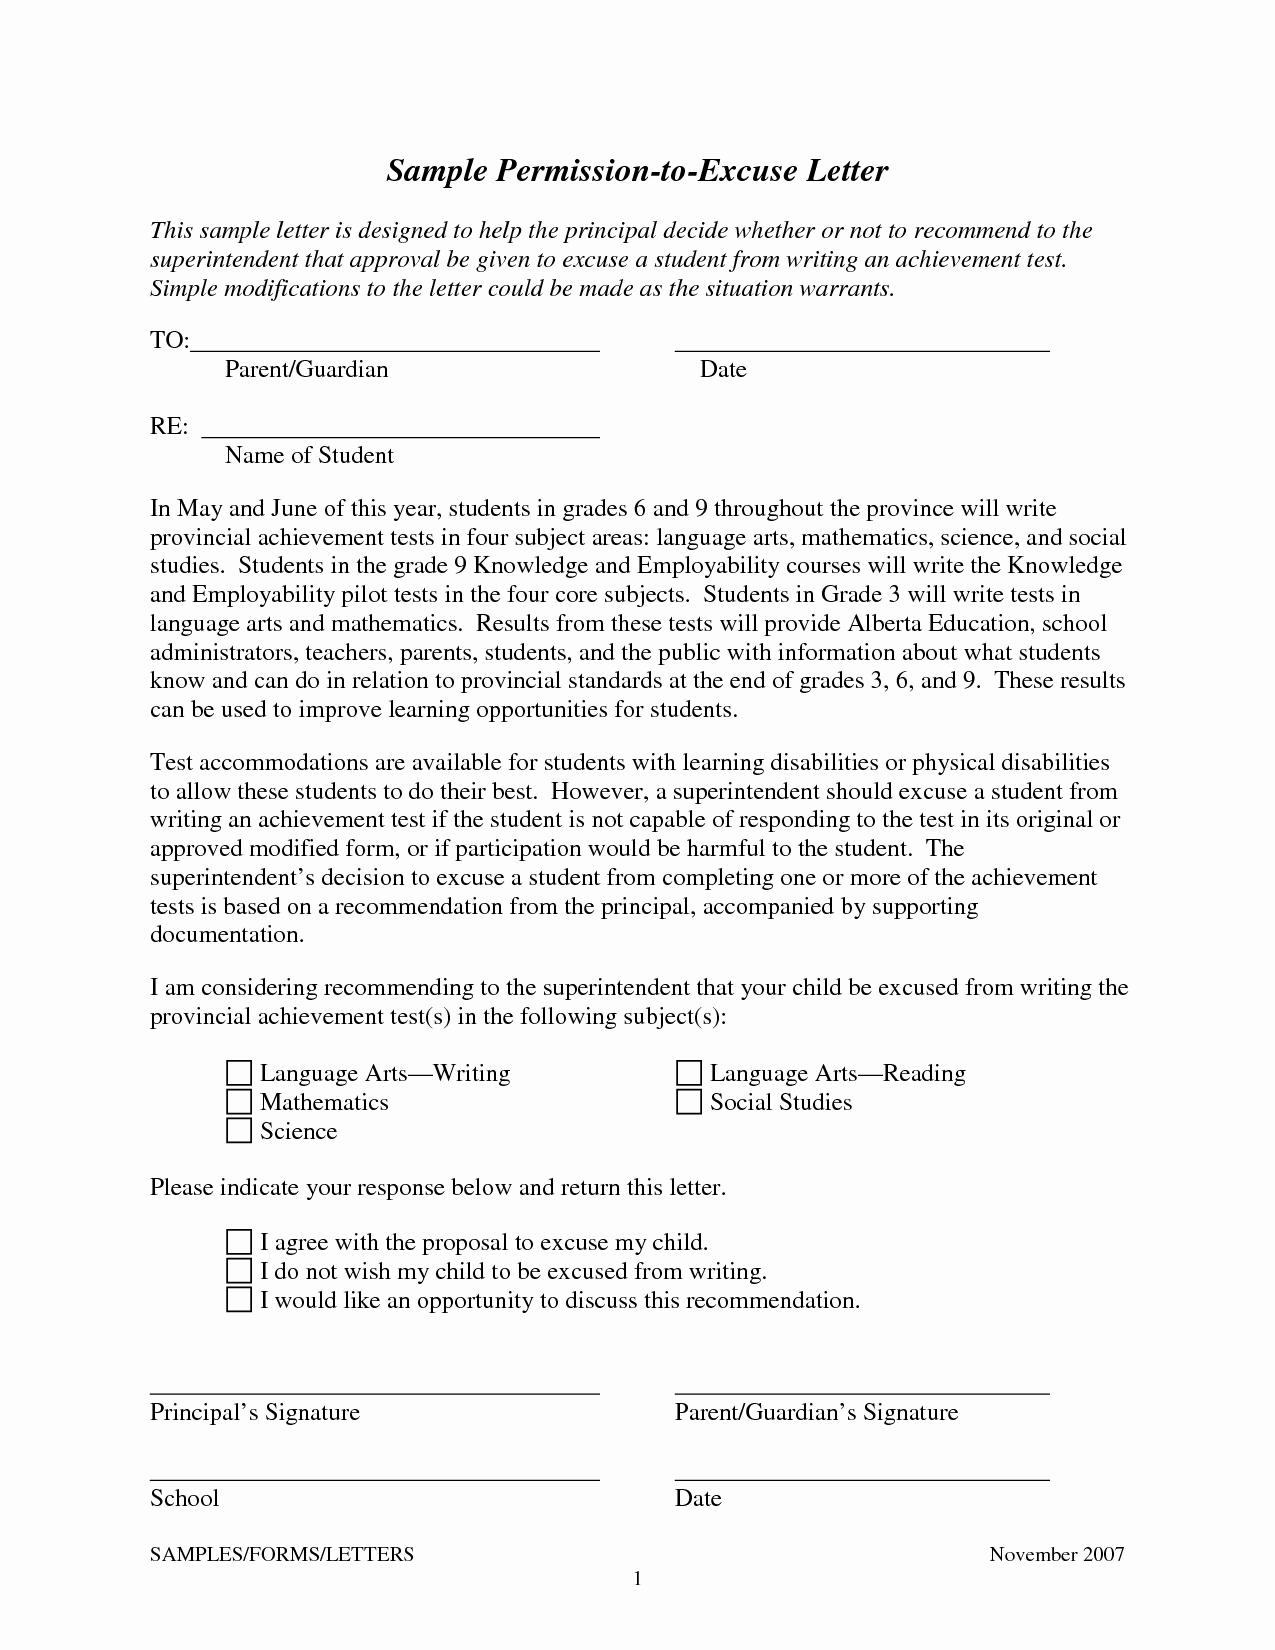 Jury Duty Hardship Letter From Employer Inspirational Jury Exemption Letter Sample